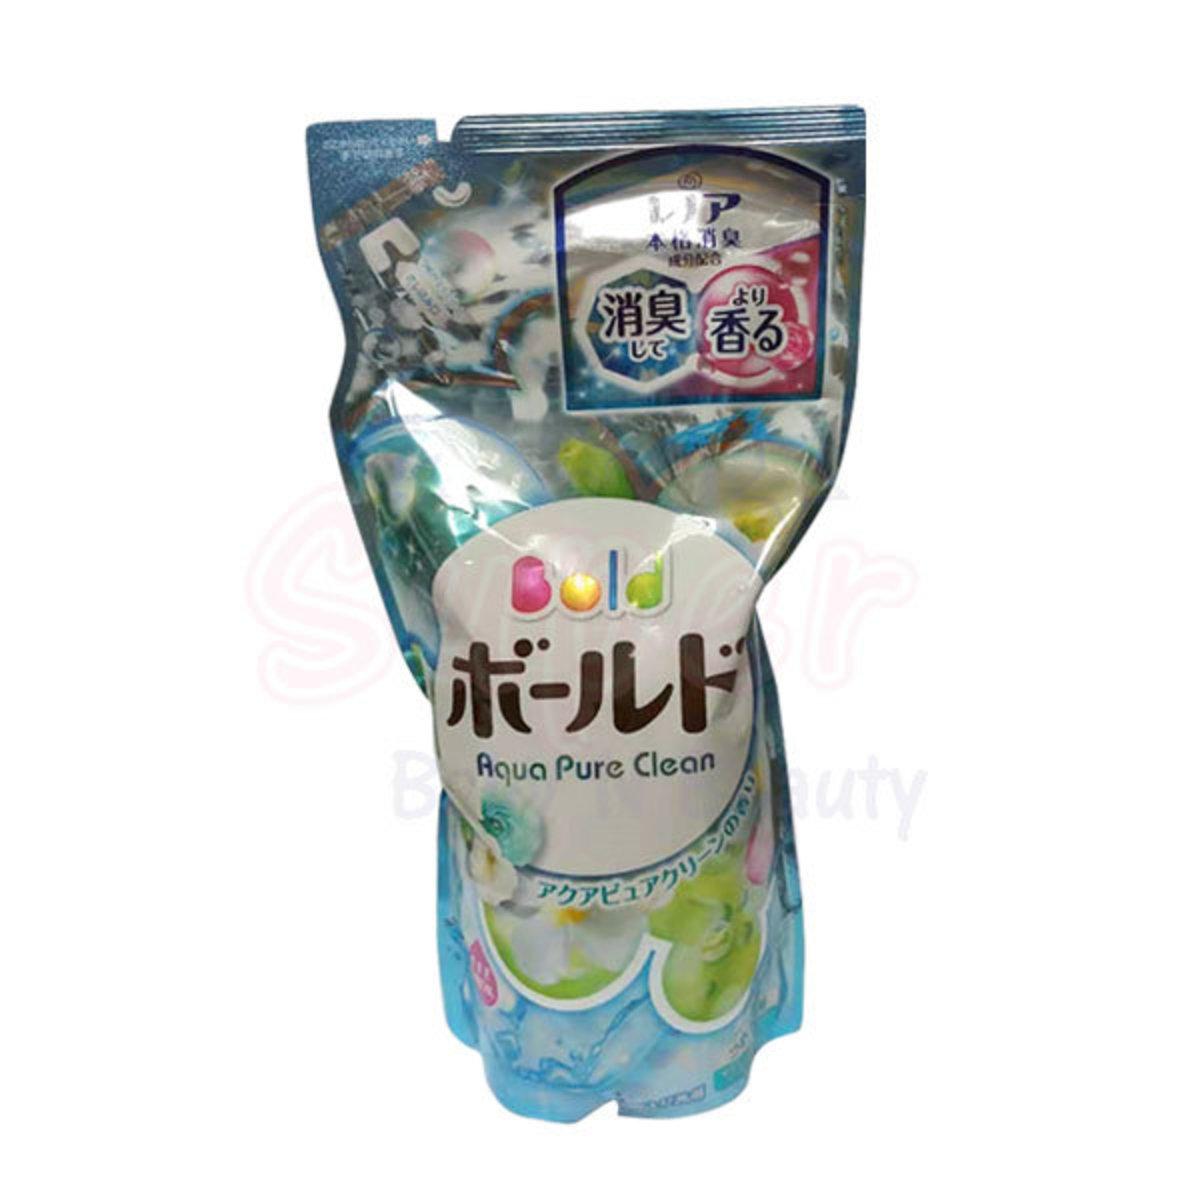 P&G Bold 花香香味柔順洗衣液(補充裝) 715g (粉藍)